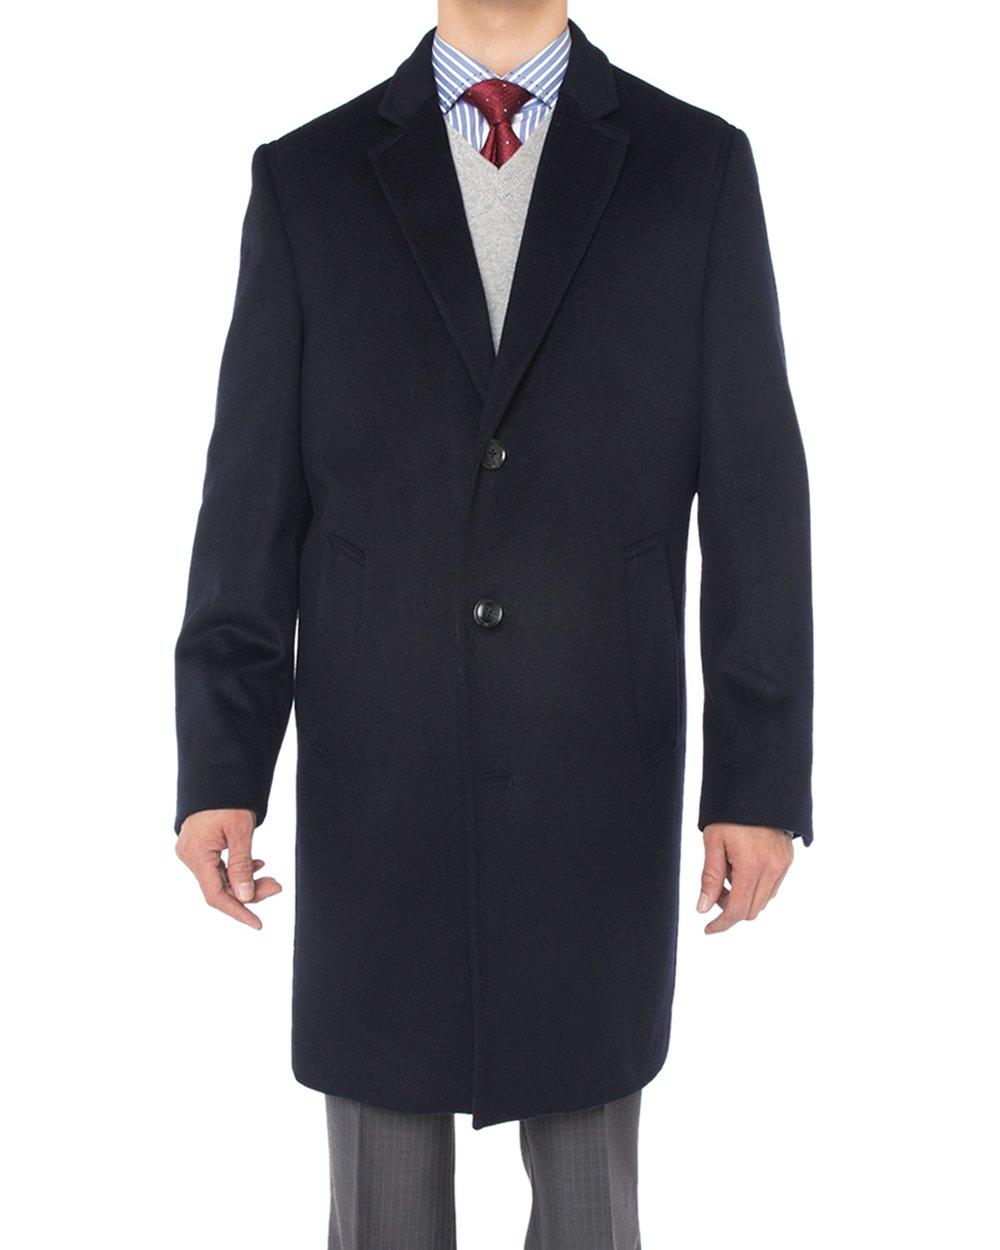 Luciano Natazzi Men's Cashmere Wool Overcoat Knee Length Trench Coat Topcoat (52 US - 62 EU, Navy Blue) by Luciano Natazzi